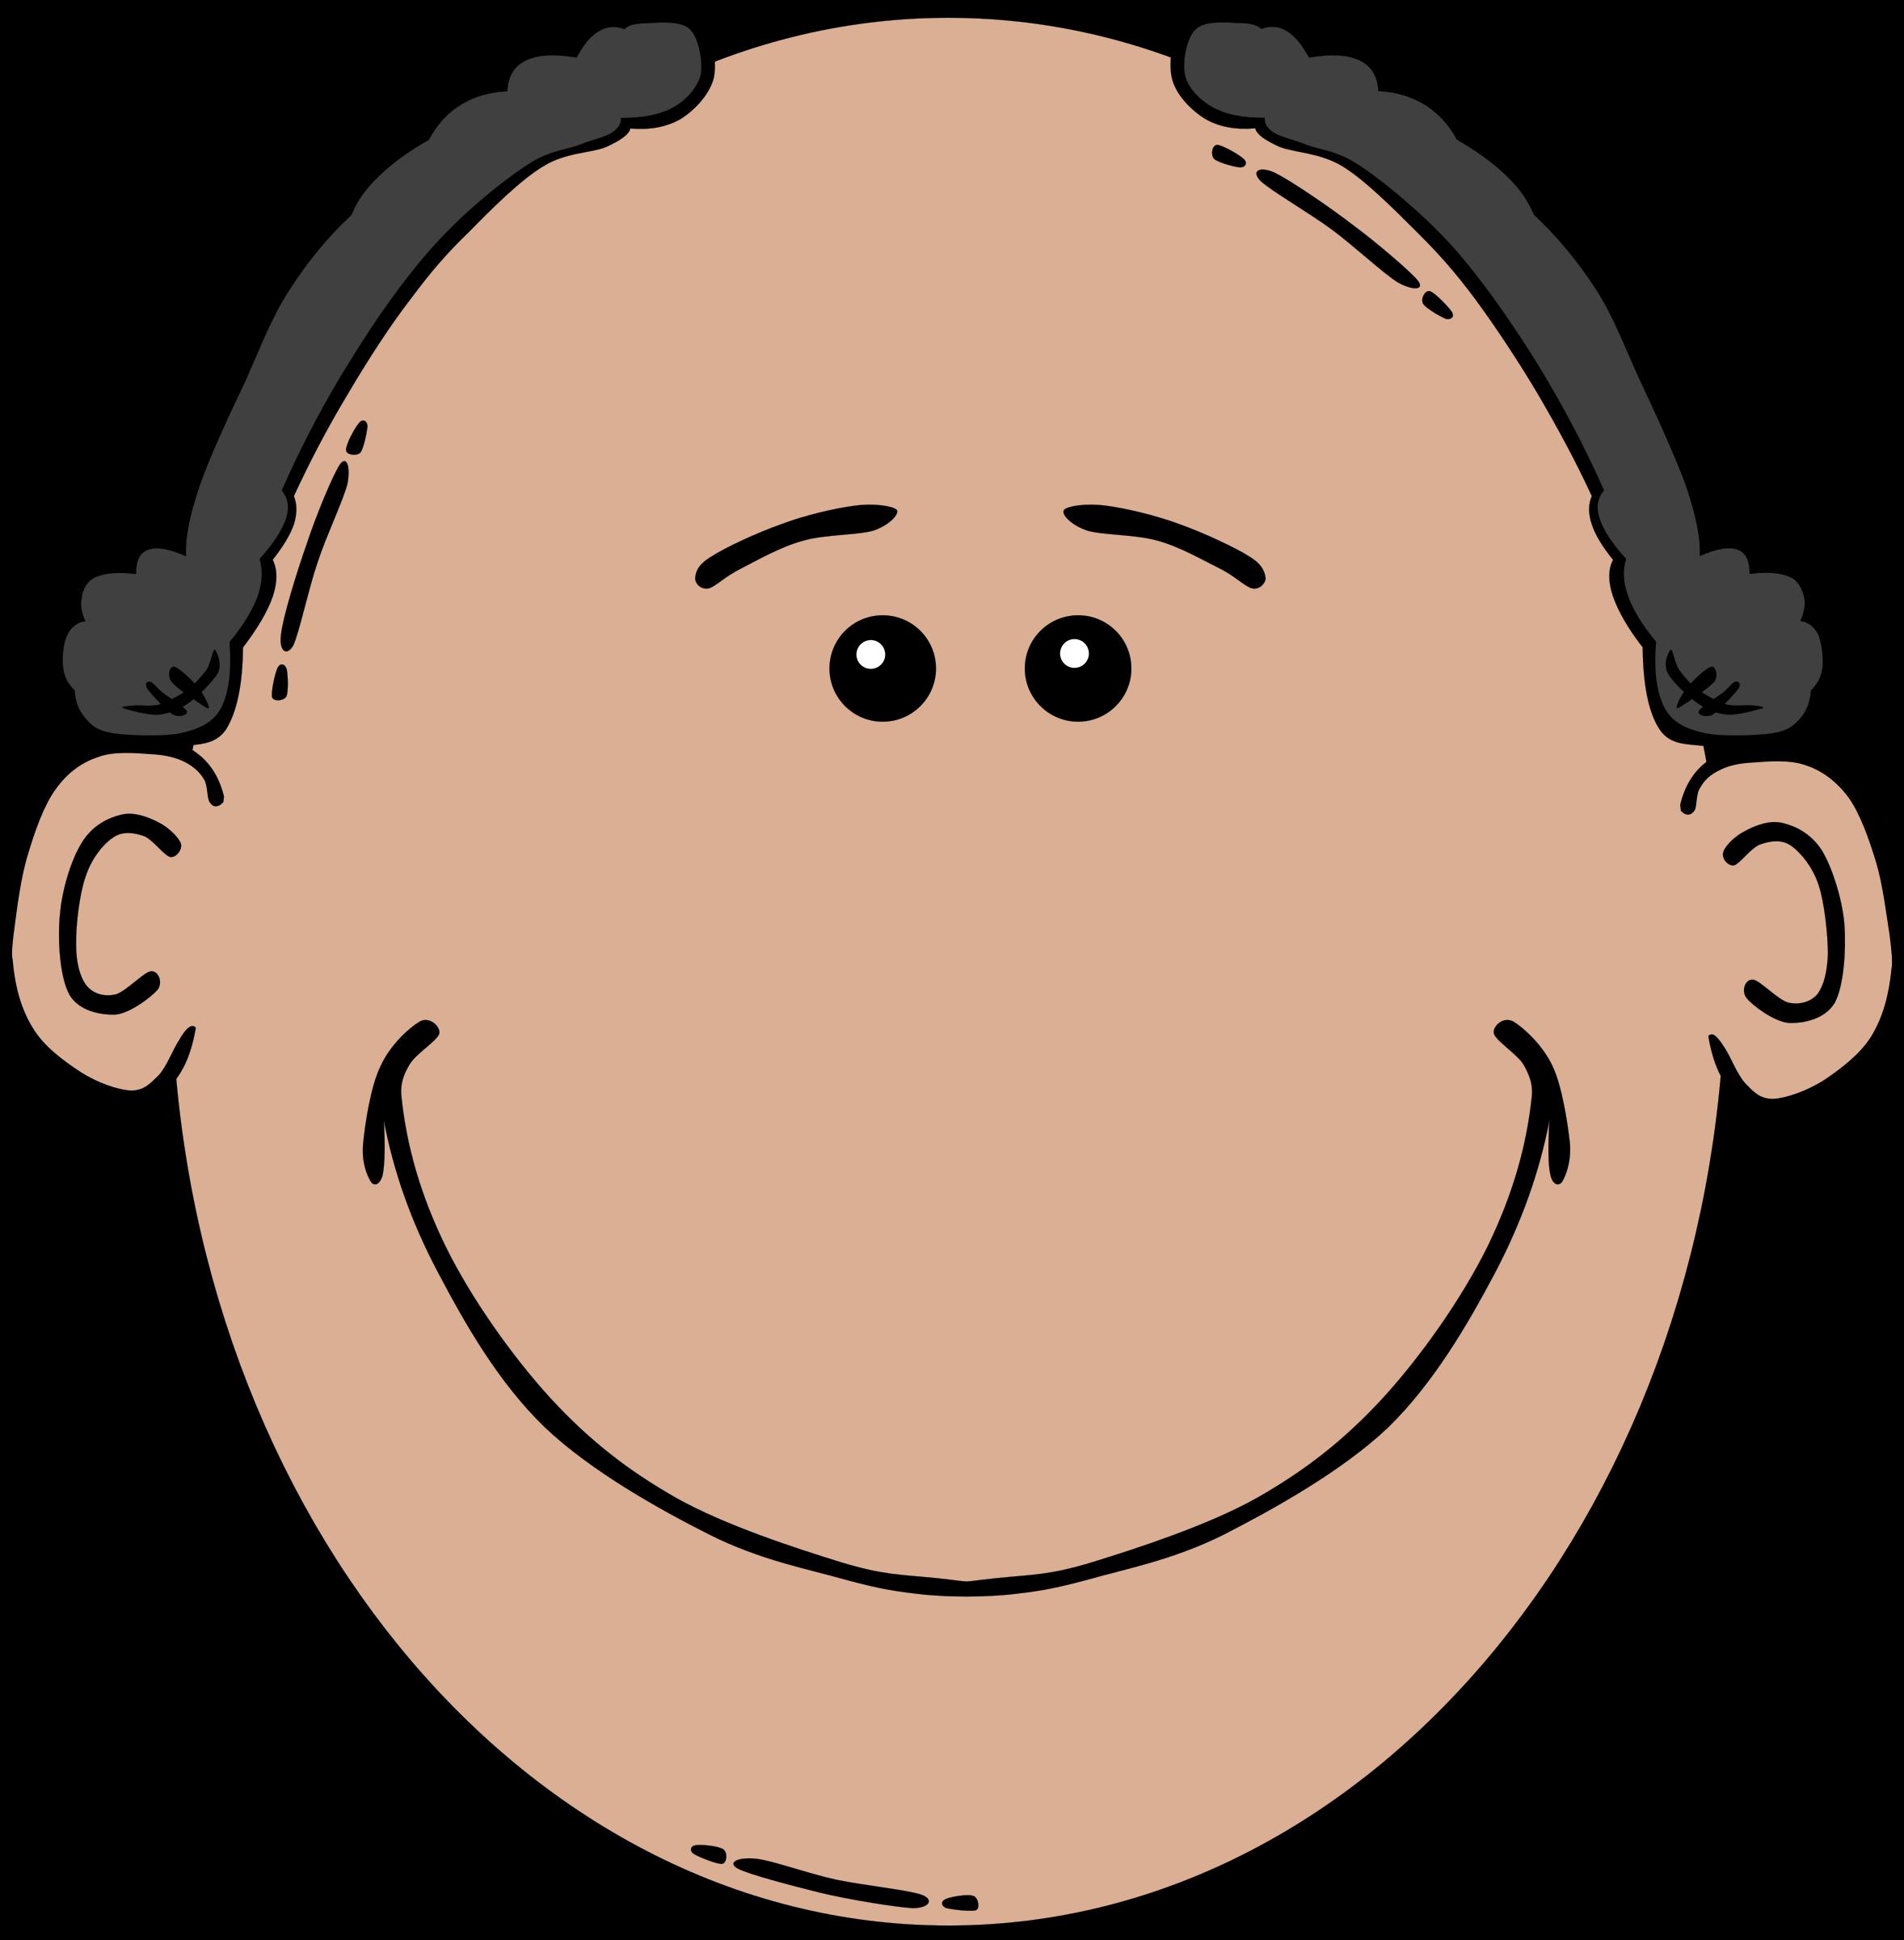 jpg free library Man face cartoon big. Chin clipart clip art.